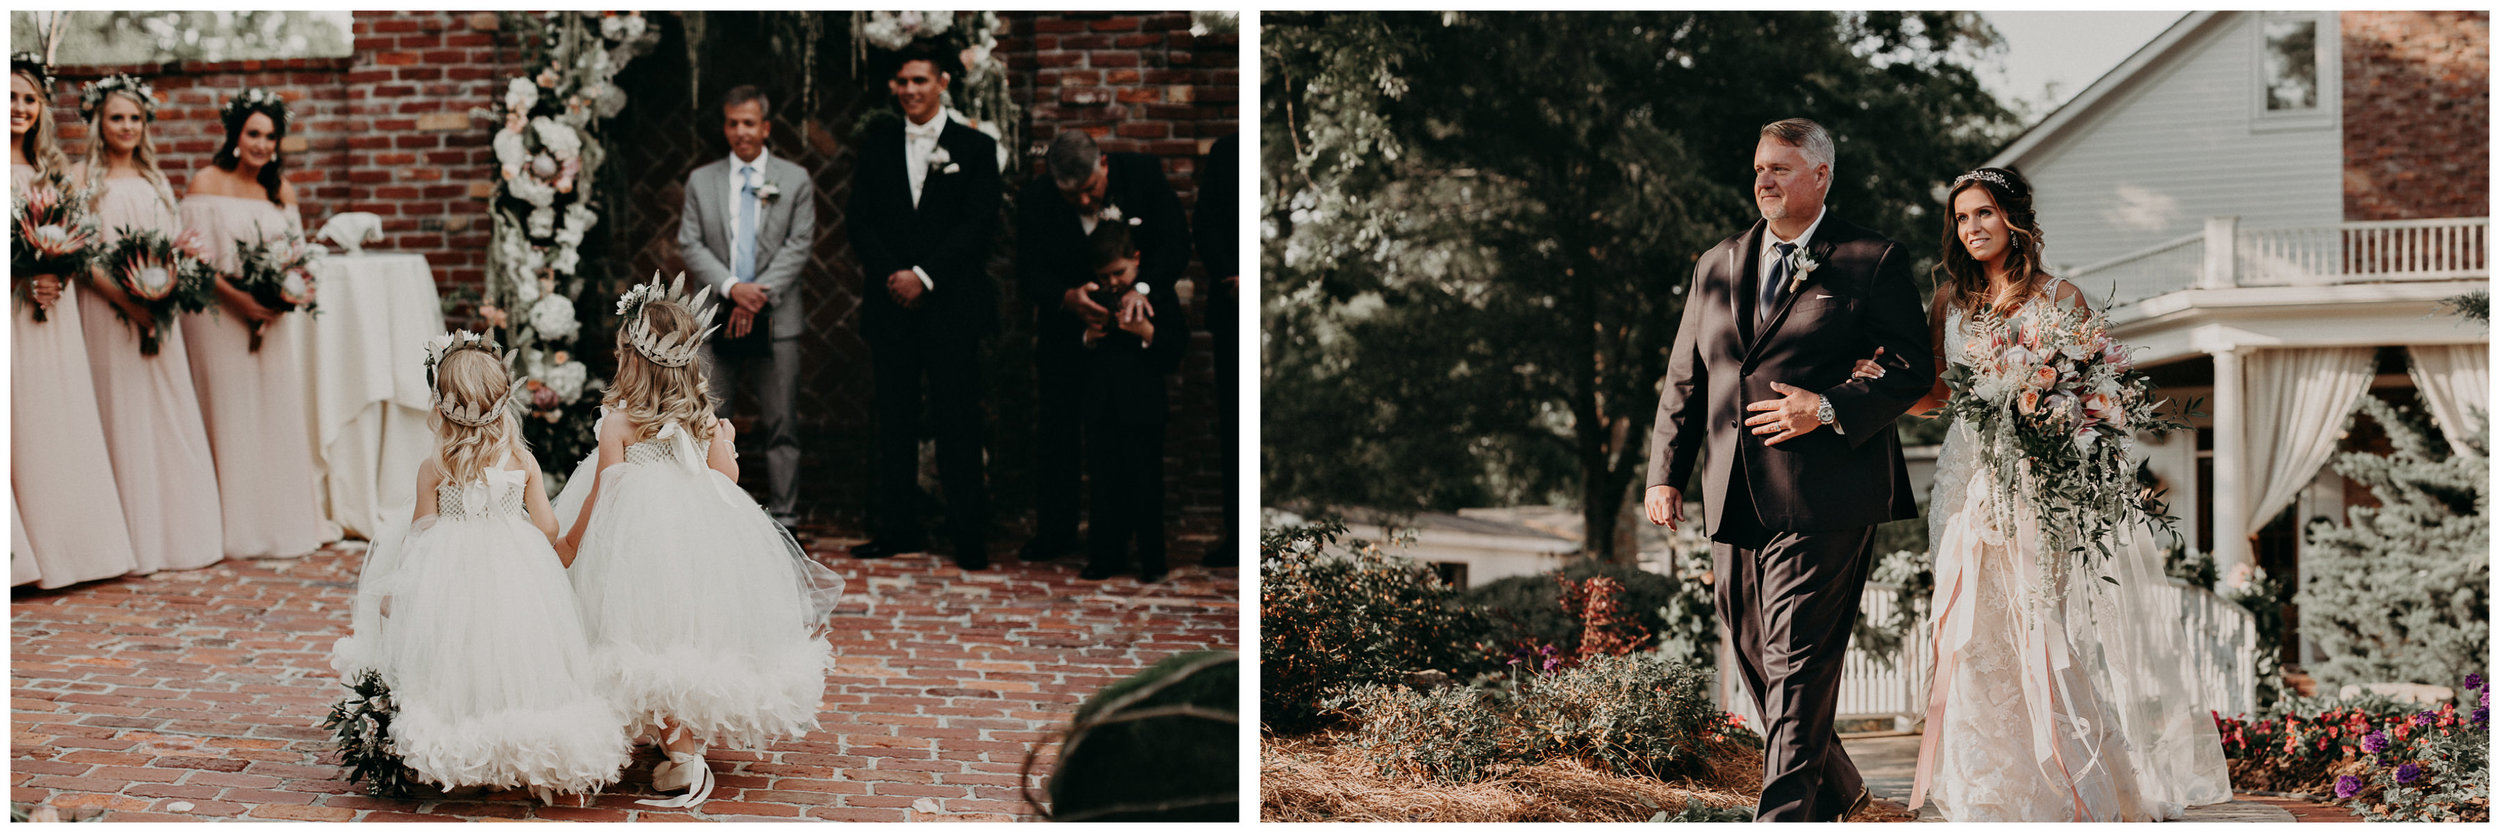 67Carl House Wedding Venue Ga, Atlanta Wedding Photographer - Boho, Bohemian, Junebug Weddings, Vintage, Retro, Trendy. Aline Marin Photography. .jpg